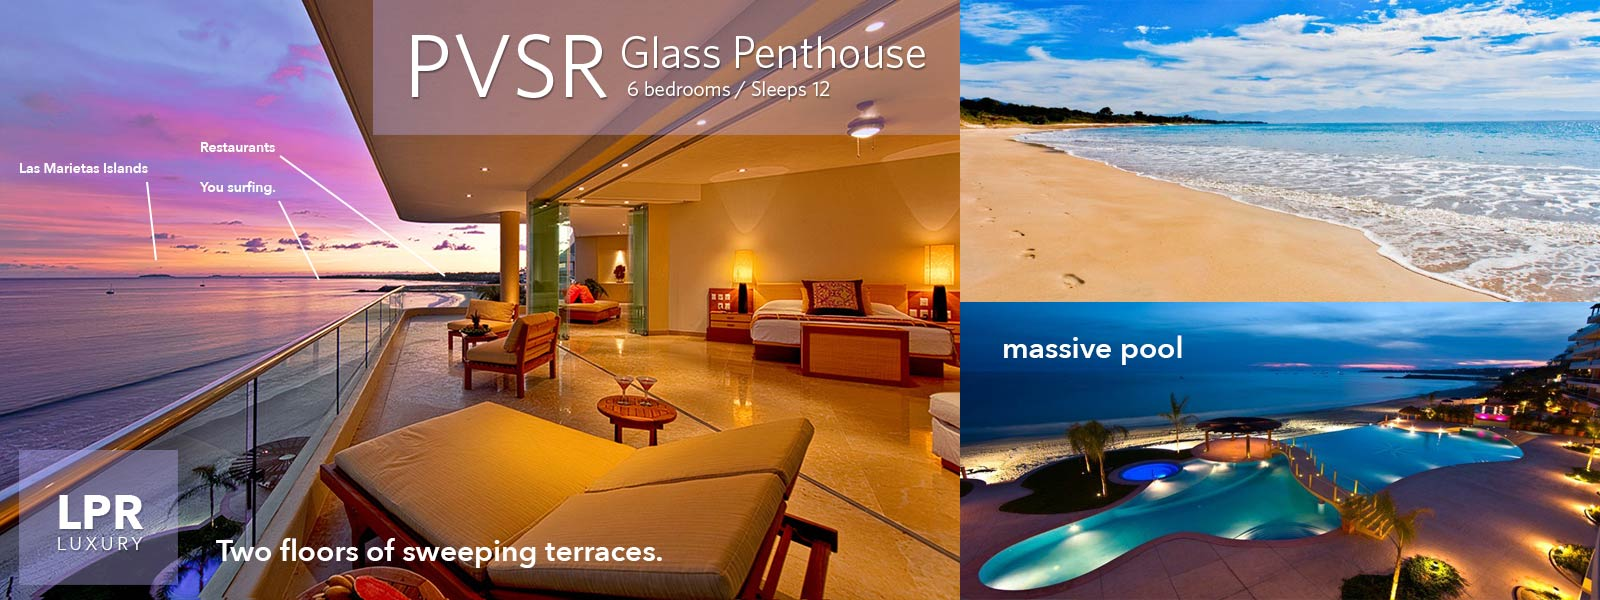 PVSR - The Glass Penthouse at Punta de Mita, Vallarta | Nayarit, Mexico